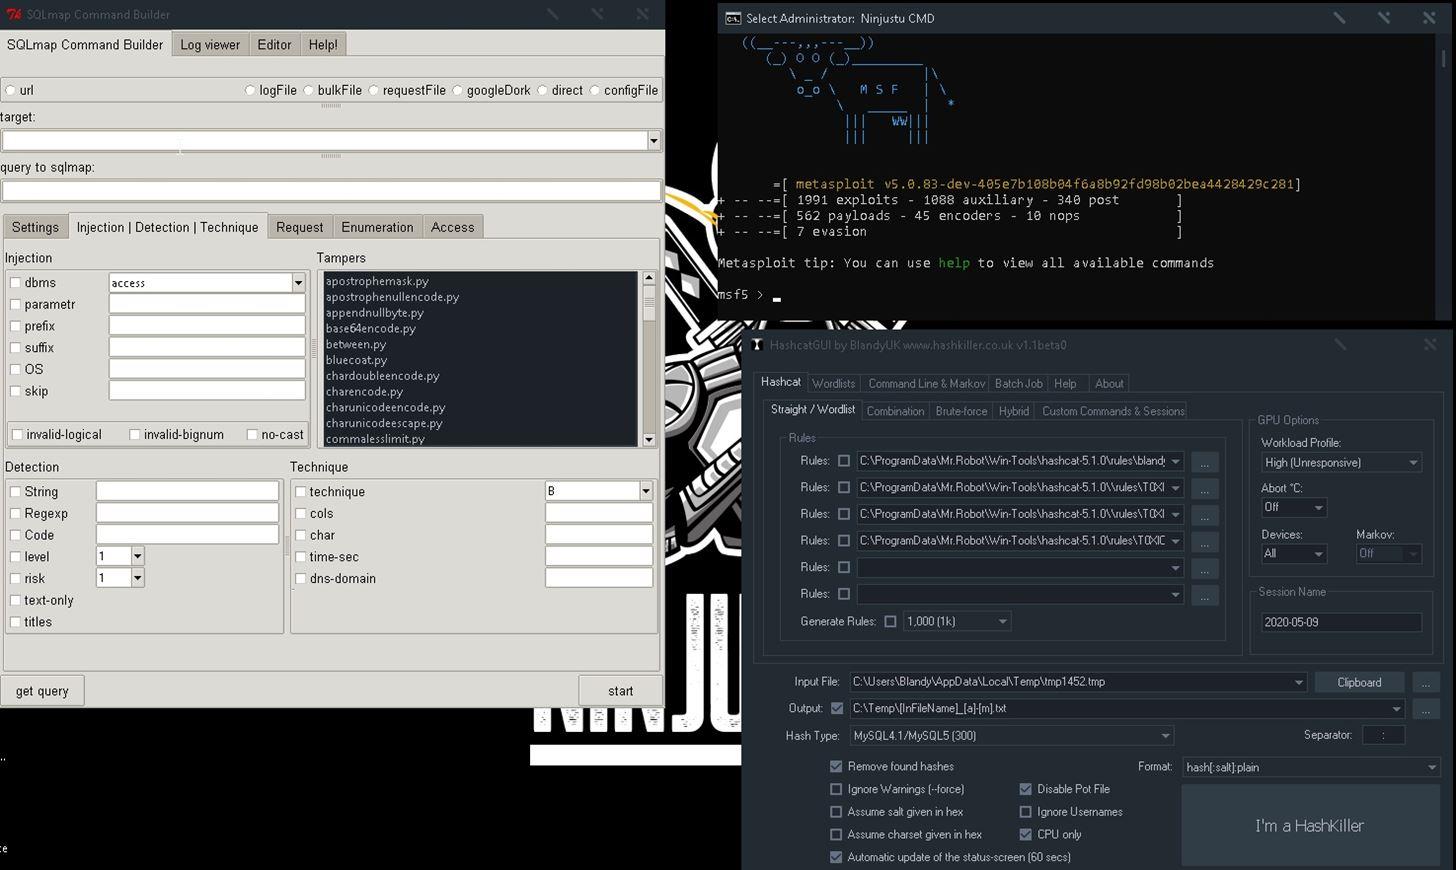 Ninjutsu Project Penetration Testing/Red Teaming Distribution Based on Windows